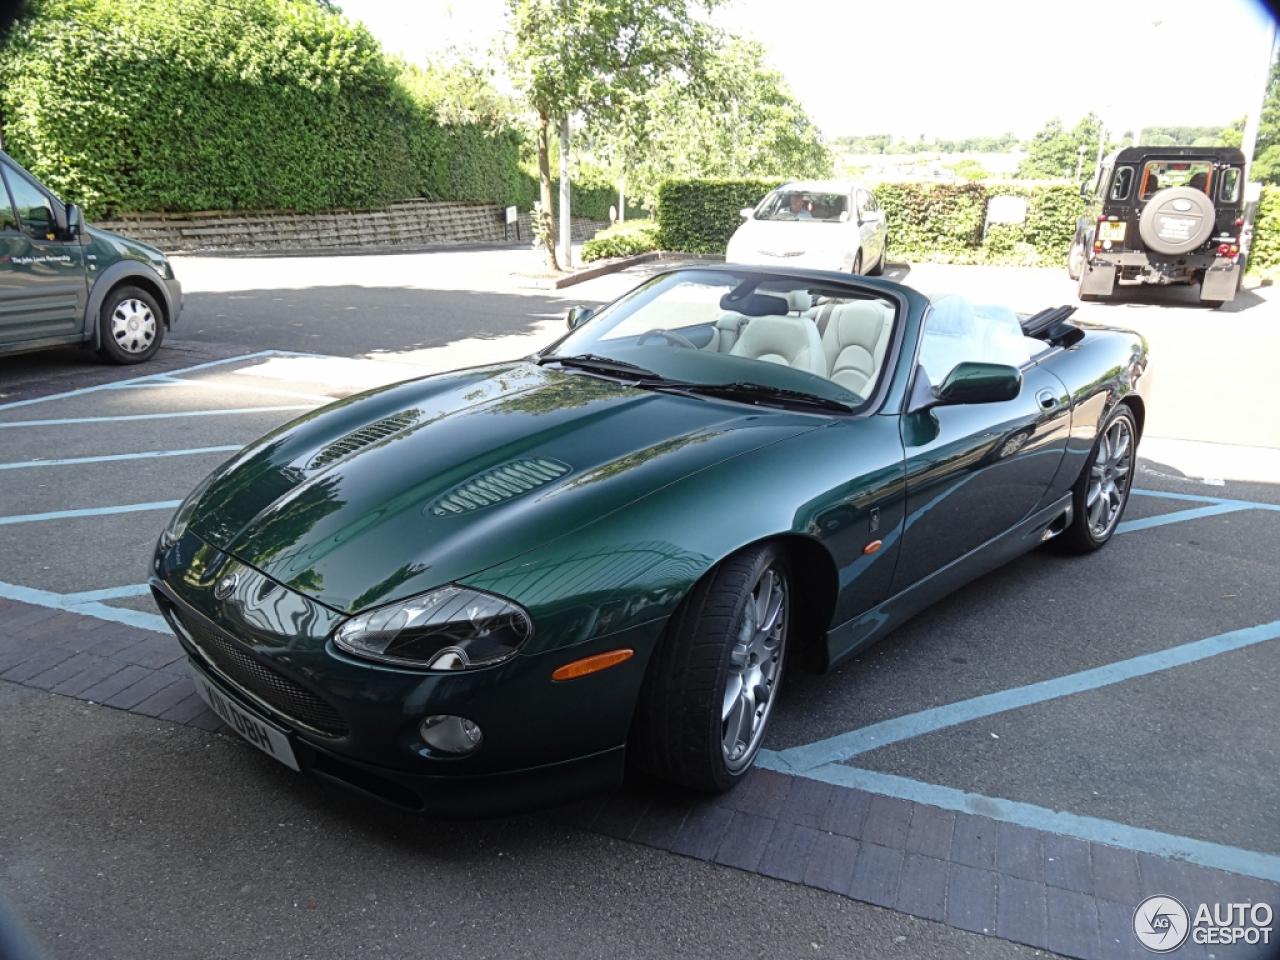 Jaguar Arden XKR Convertible - 14 July 2013 - Autogespot